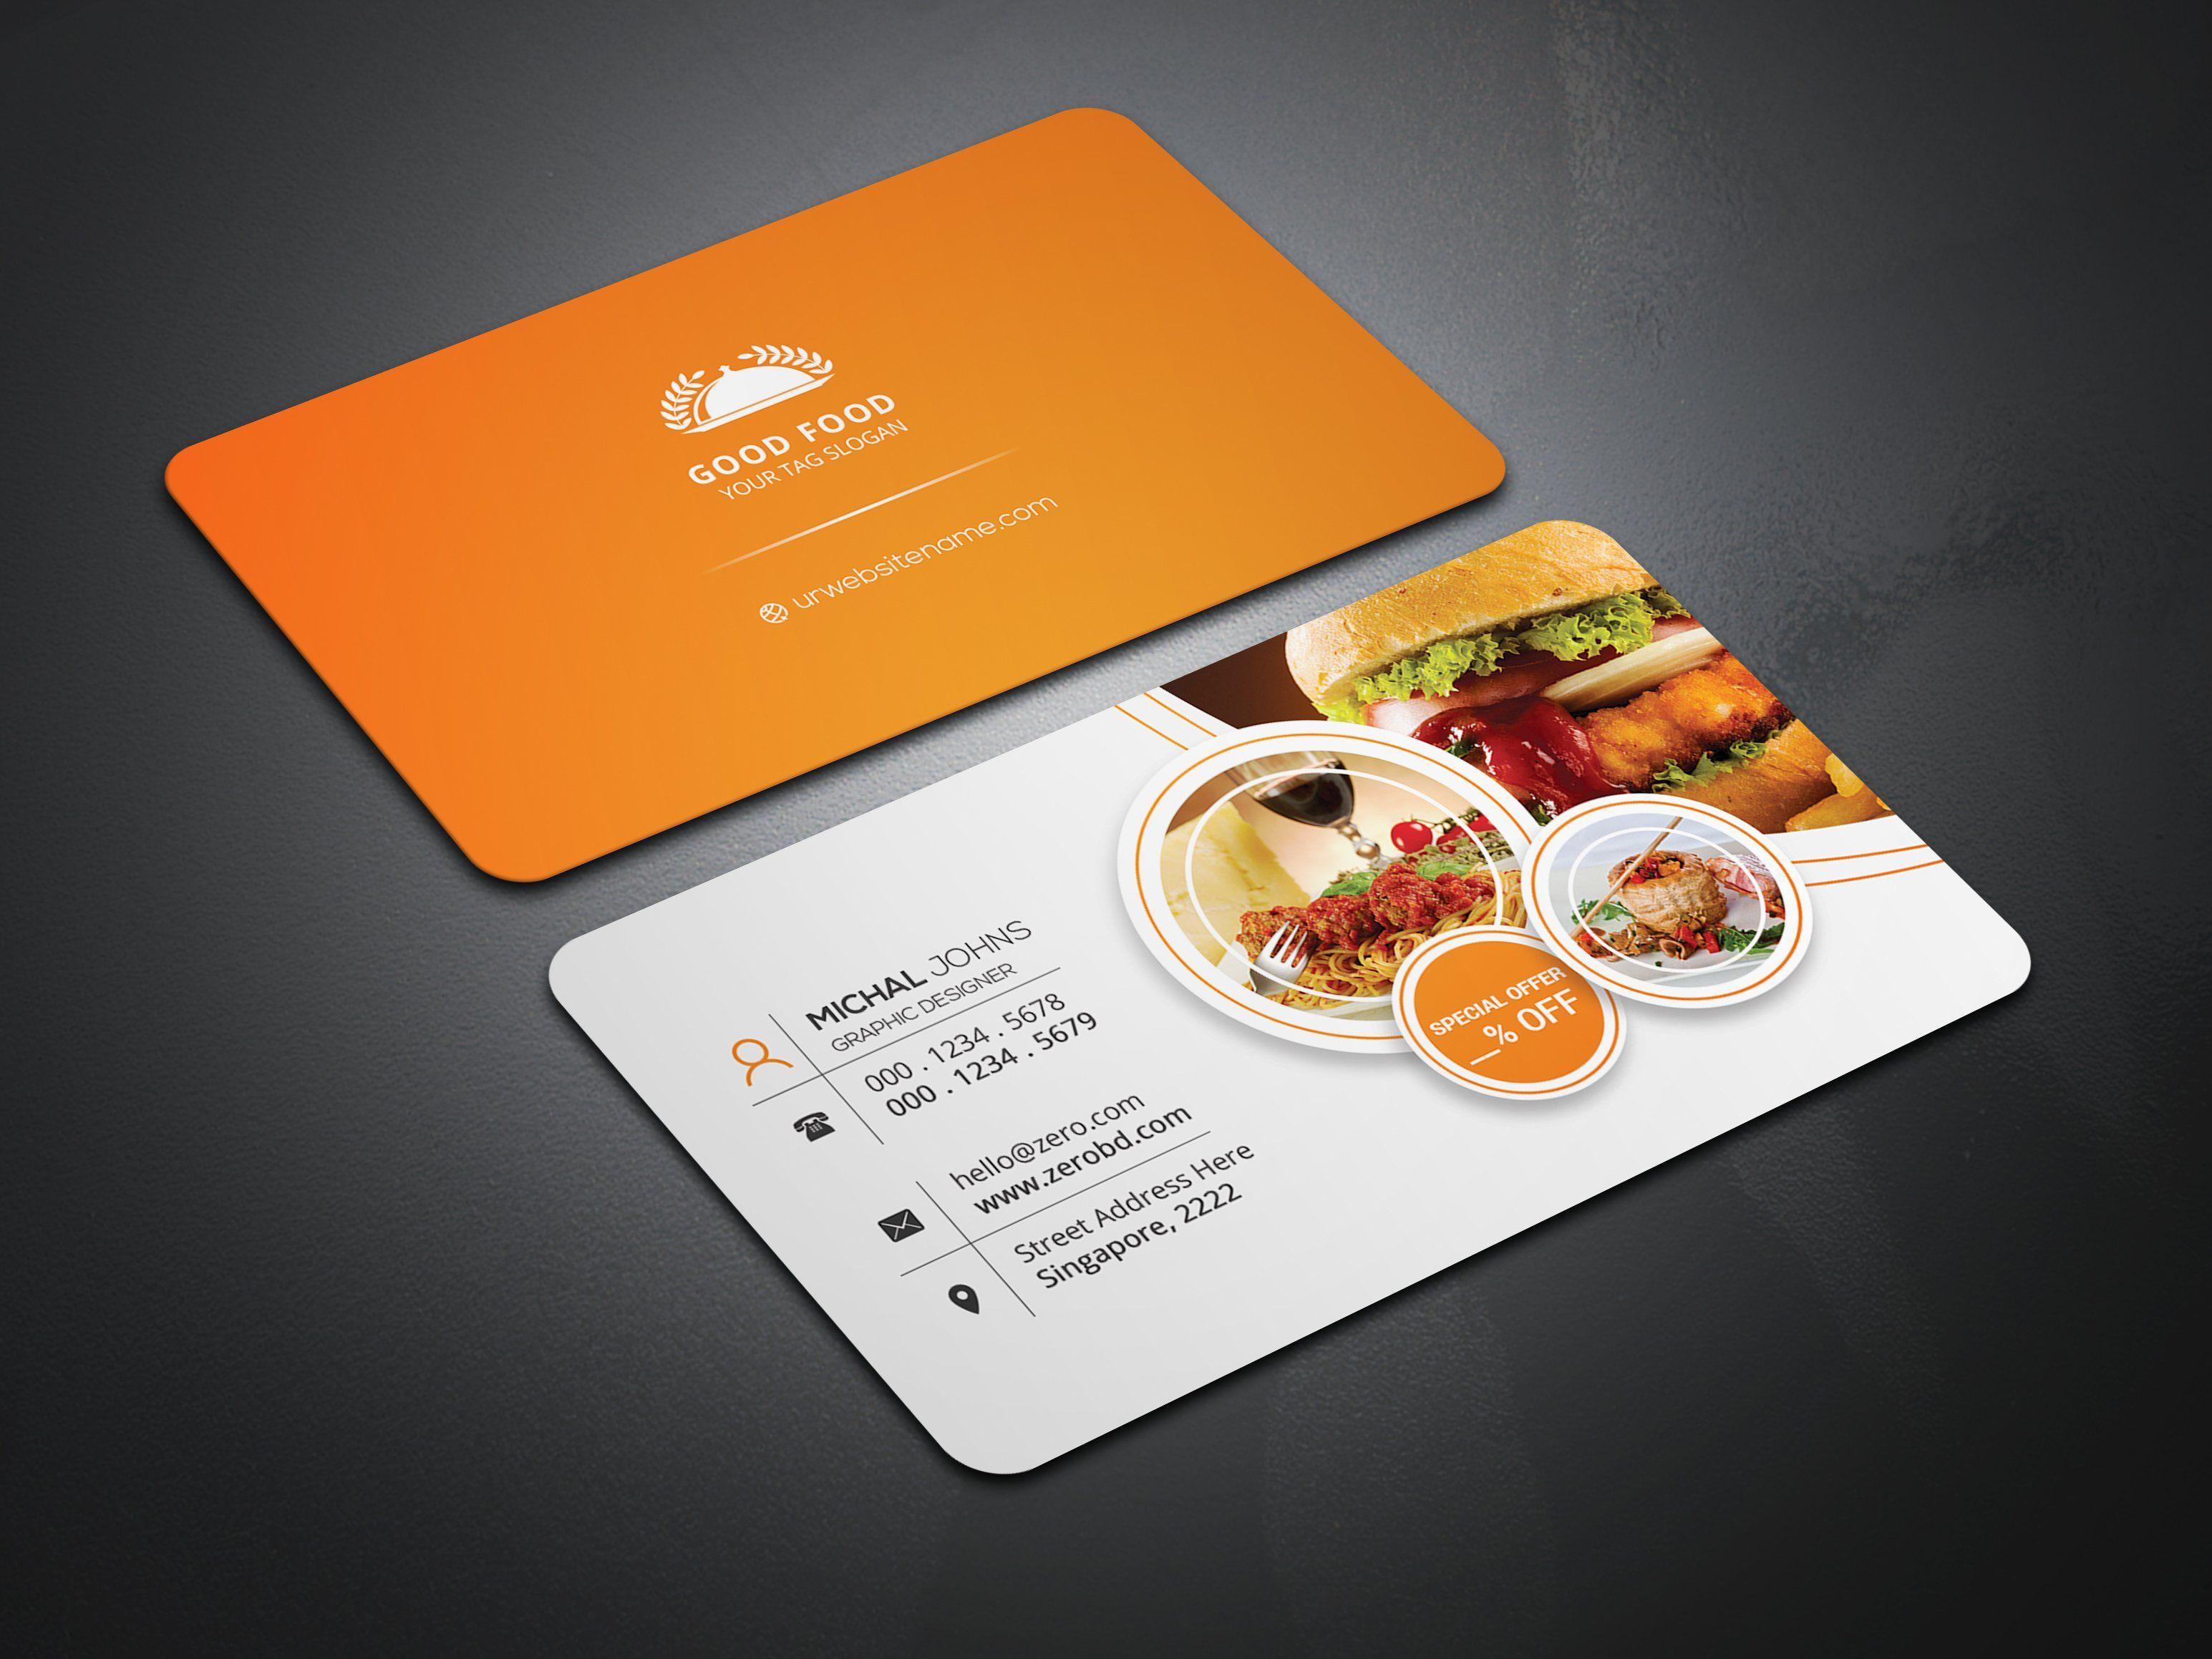 Restaurant Business Cards Food Business Card Restaurant Business Cards Restaurant Card Design